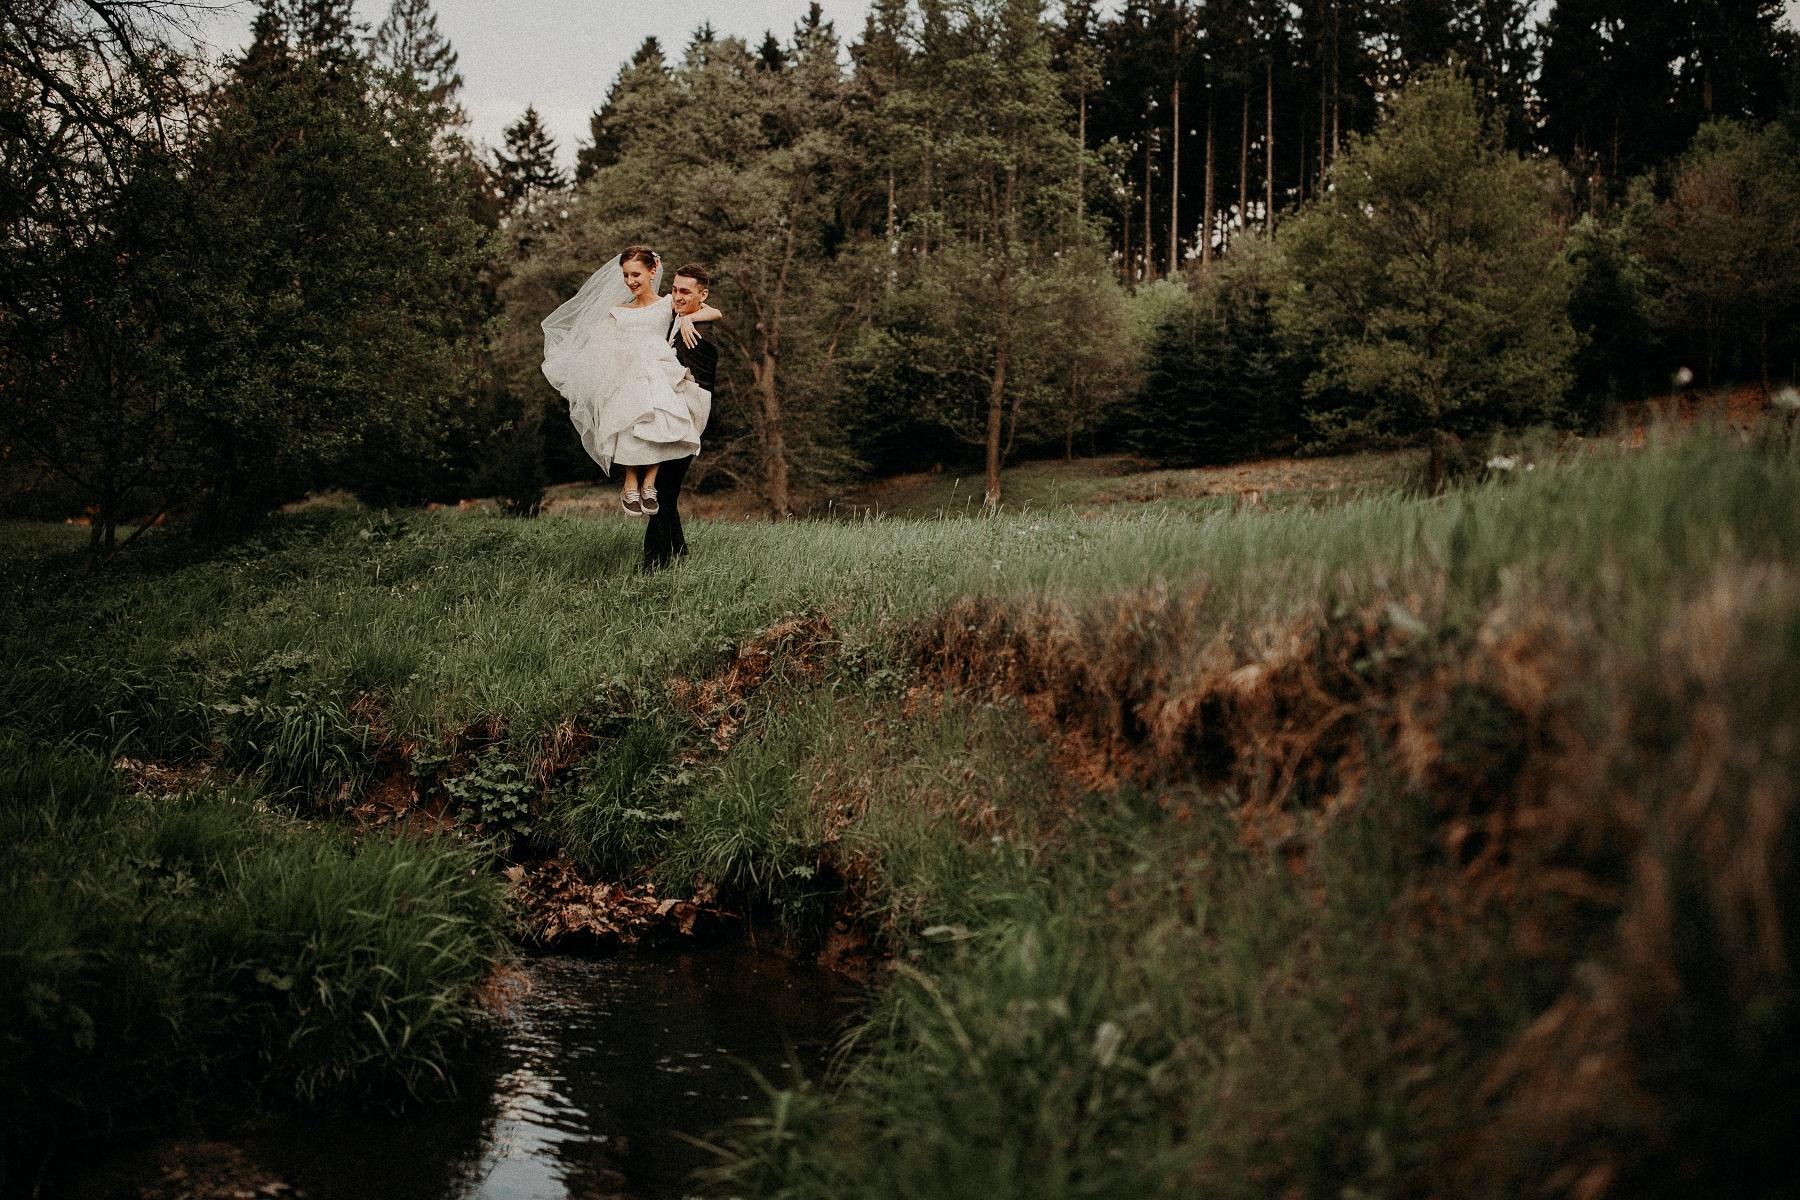 Keywords: #fotografluboskrahulec @fotografluboskrahulec;best of wedding photos;Lubos Krahulec, svadobny fotograf, fotograf vychod, slovensko, slovakia, czech, europan, presov, wedding, natural wedding portrait, best wedding photo, asociacia slovenskych svadobnych fotografov, cech fotografov, fotograf krahulec, ;najlepsi fotograf;poprad;presov;stuzkova;svadba na slovensku ;svadobne fotky v prirode;svadobny fotograf